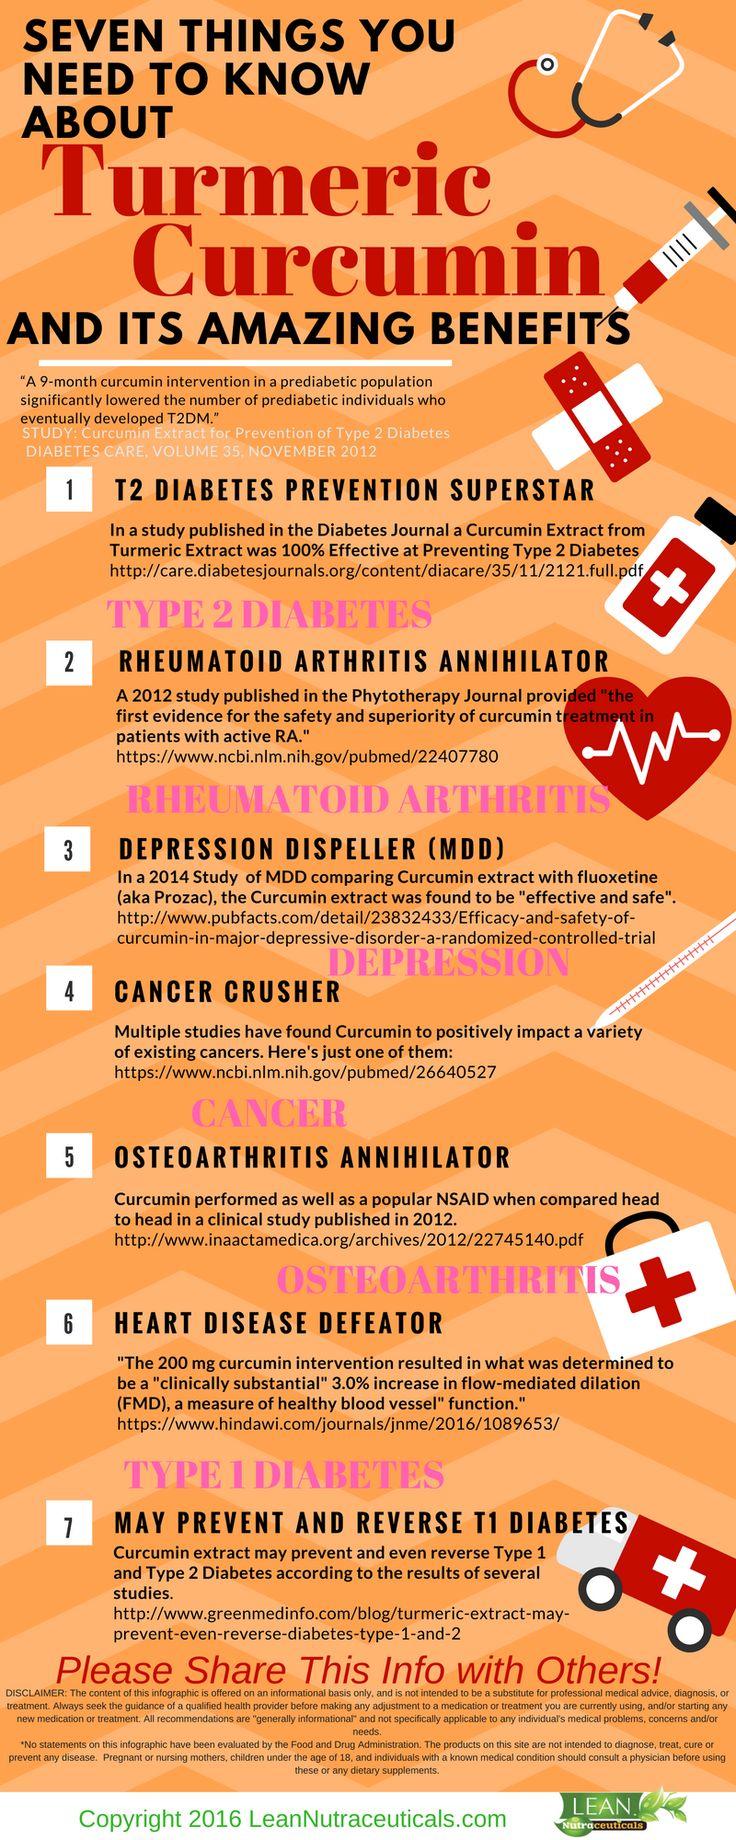 Best 25+ Curcumin benefits ideas on Pinterest | Curcumin health ...